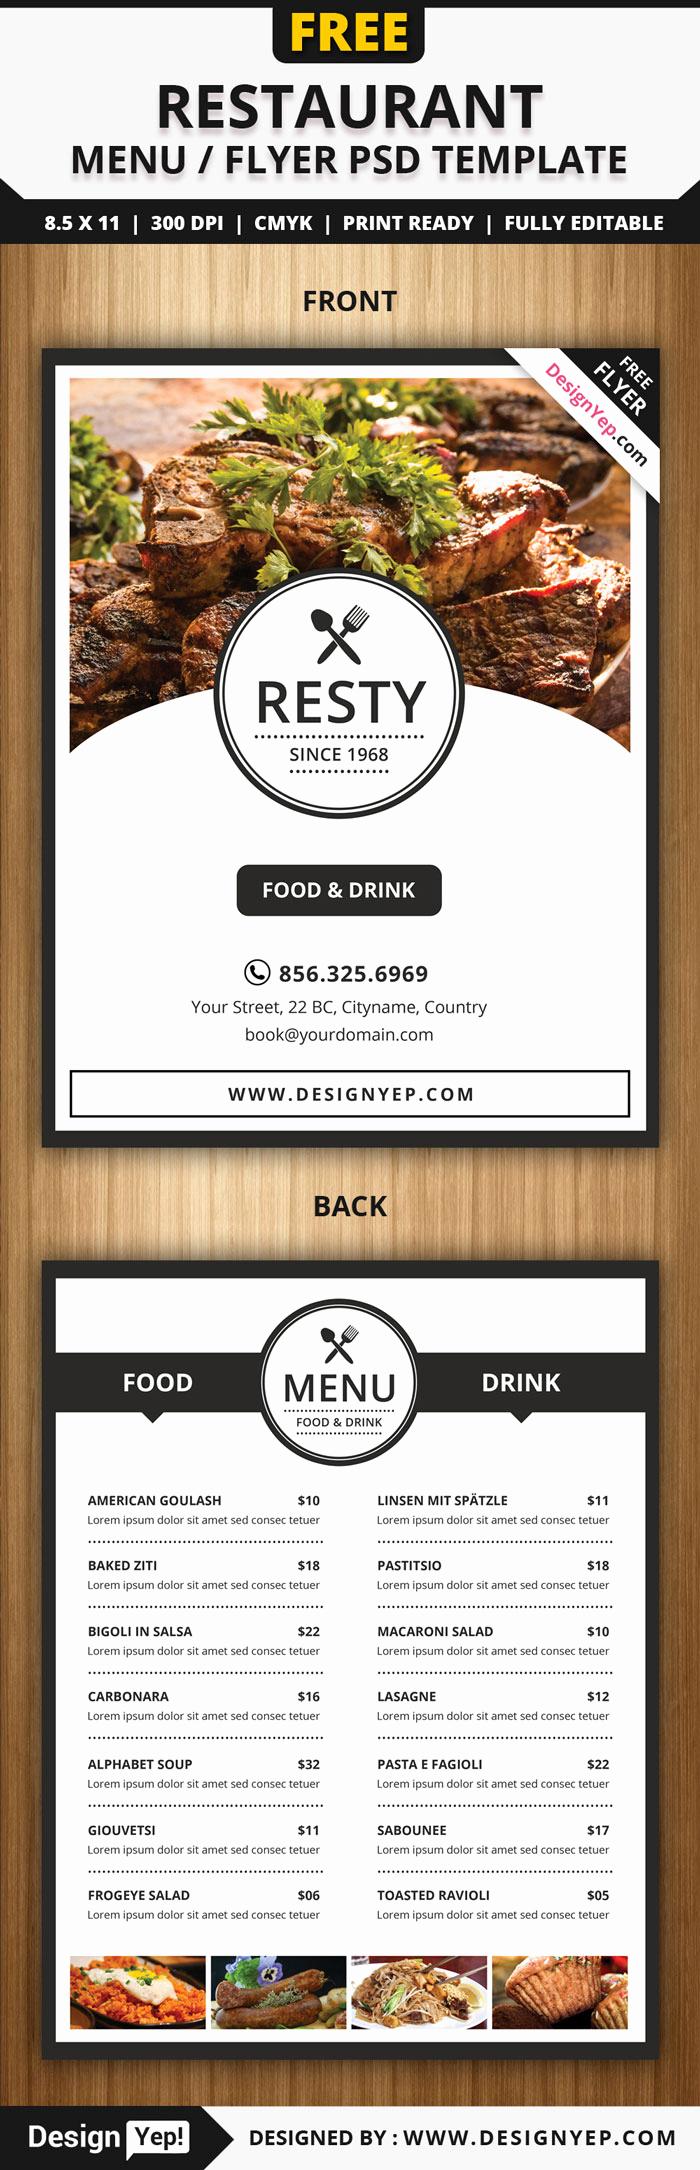 Restaurant Menu Template Free Unique 30 Free Restaurant and Food Menu Flyer Templates Designyep